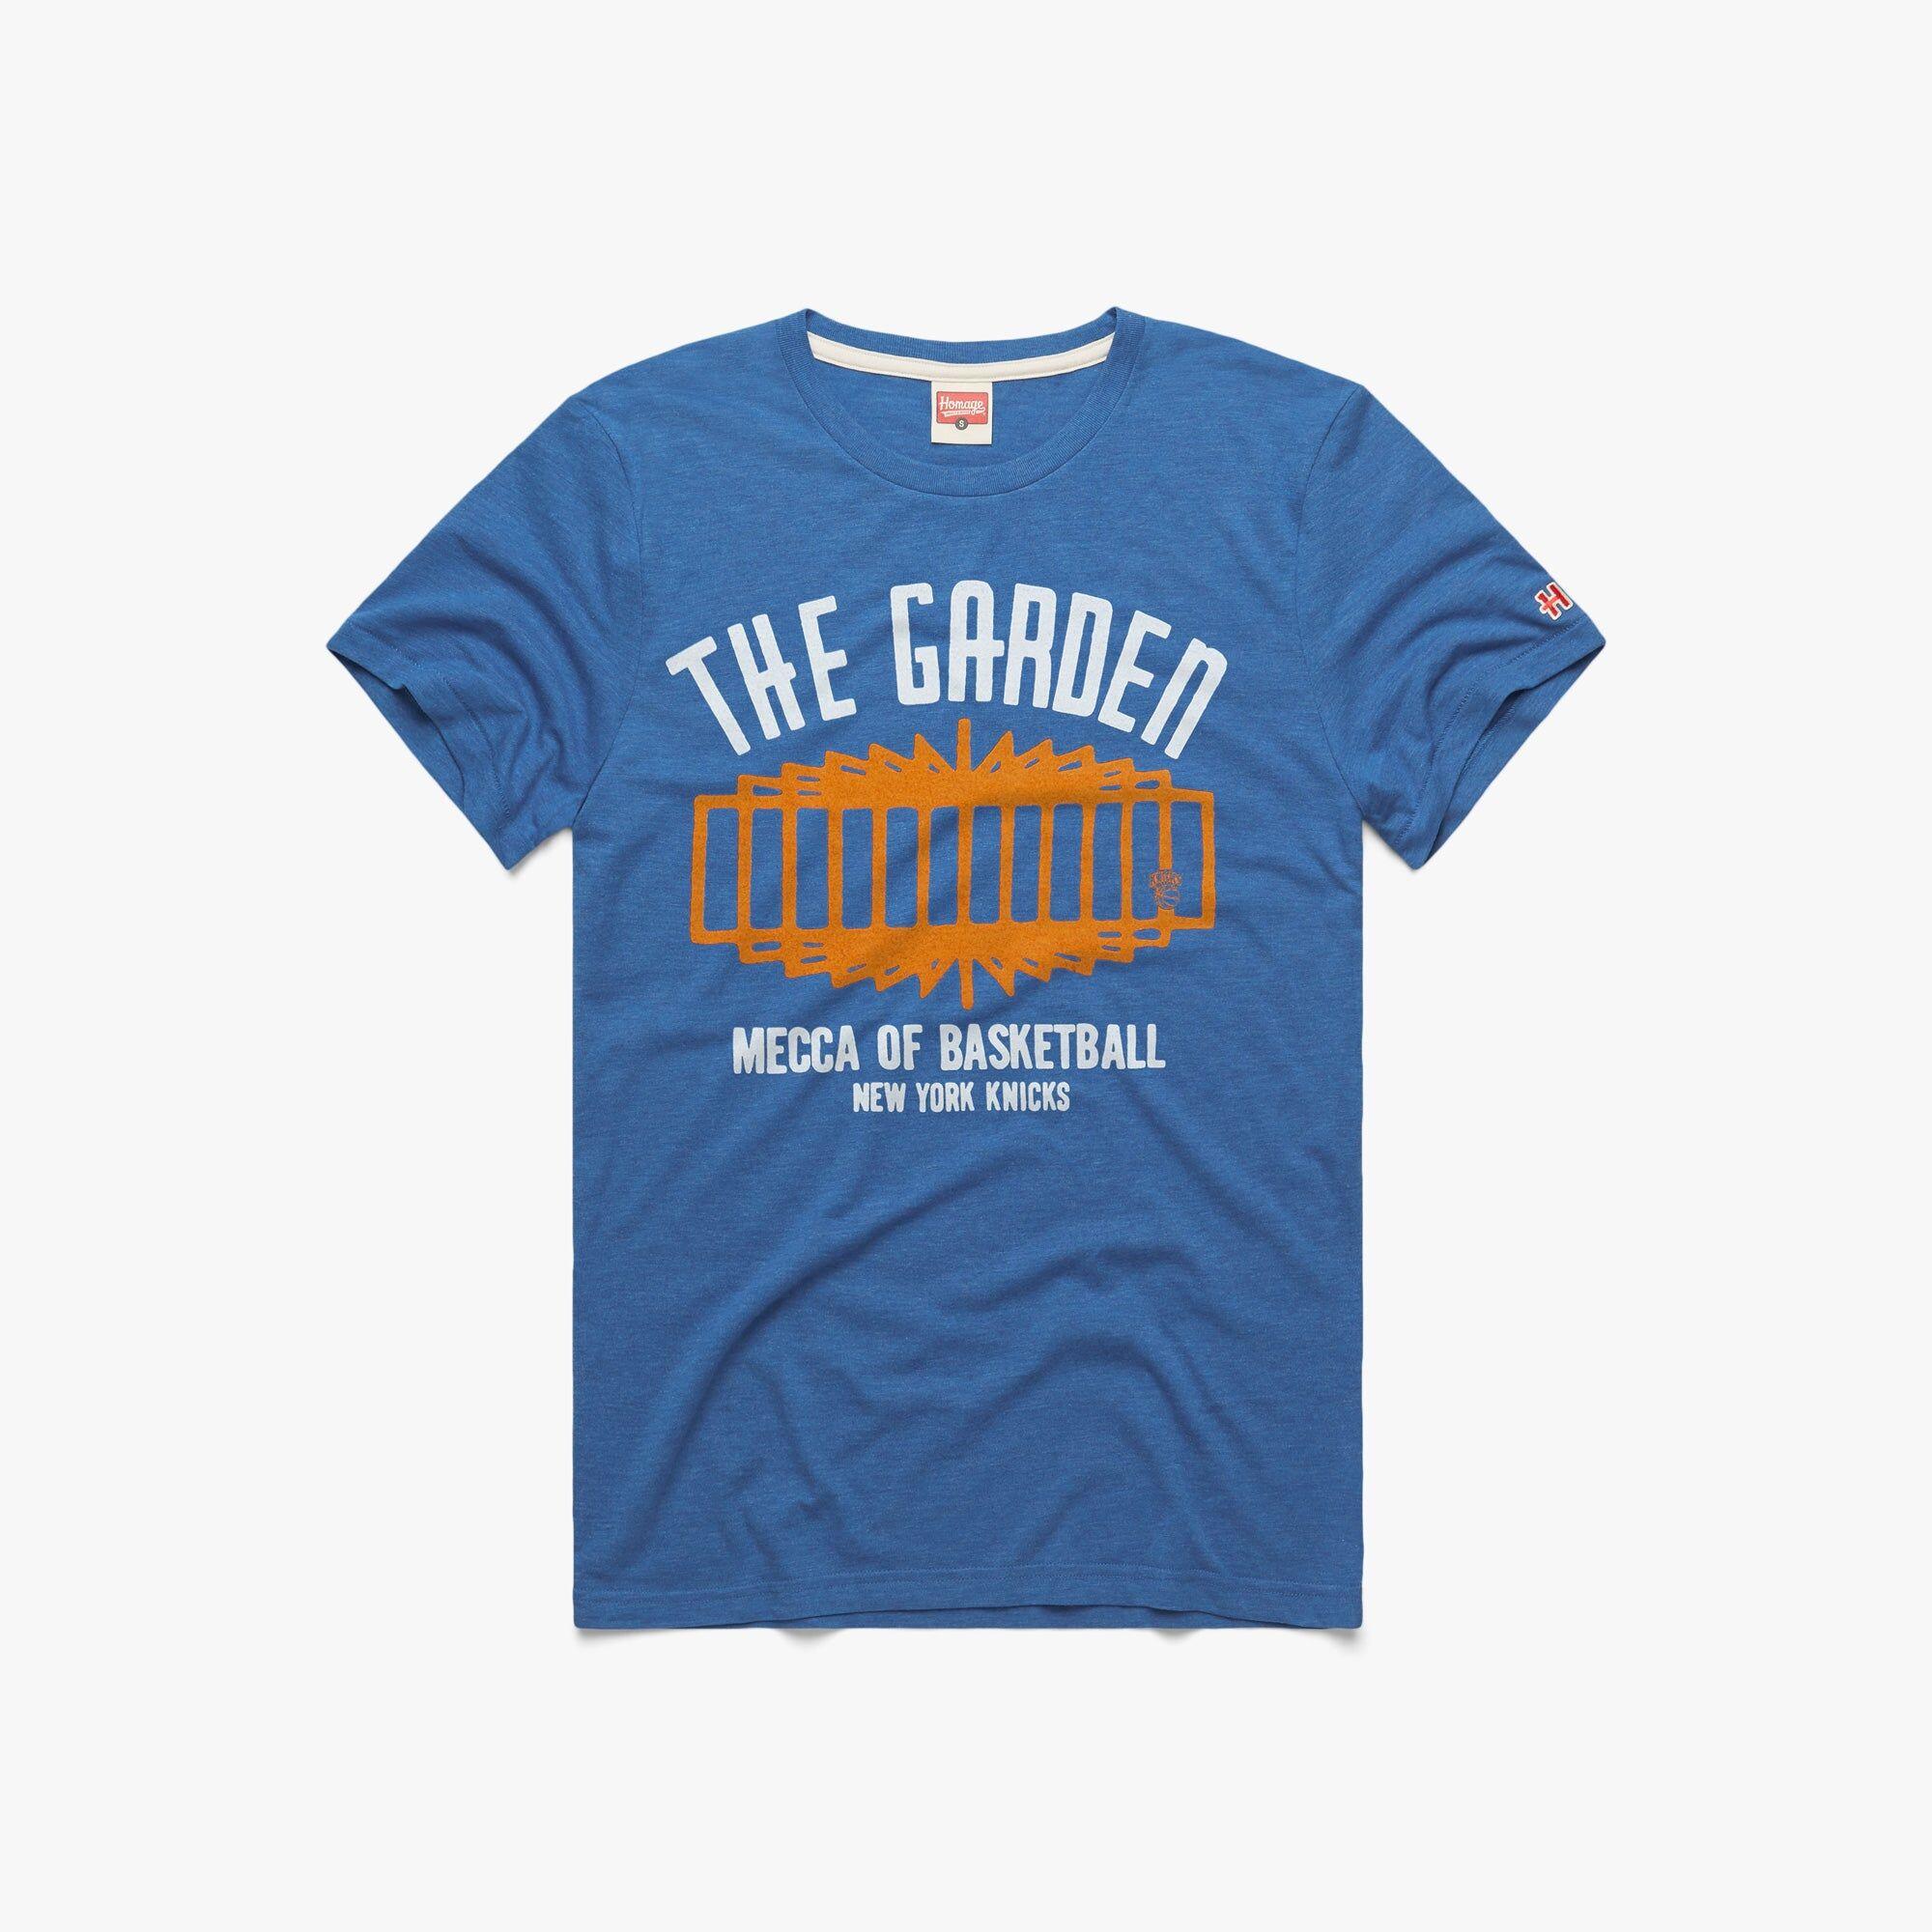 HOMAGE New York Knicks The Garden in  Blue (Size: 3XL)